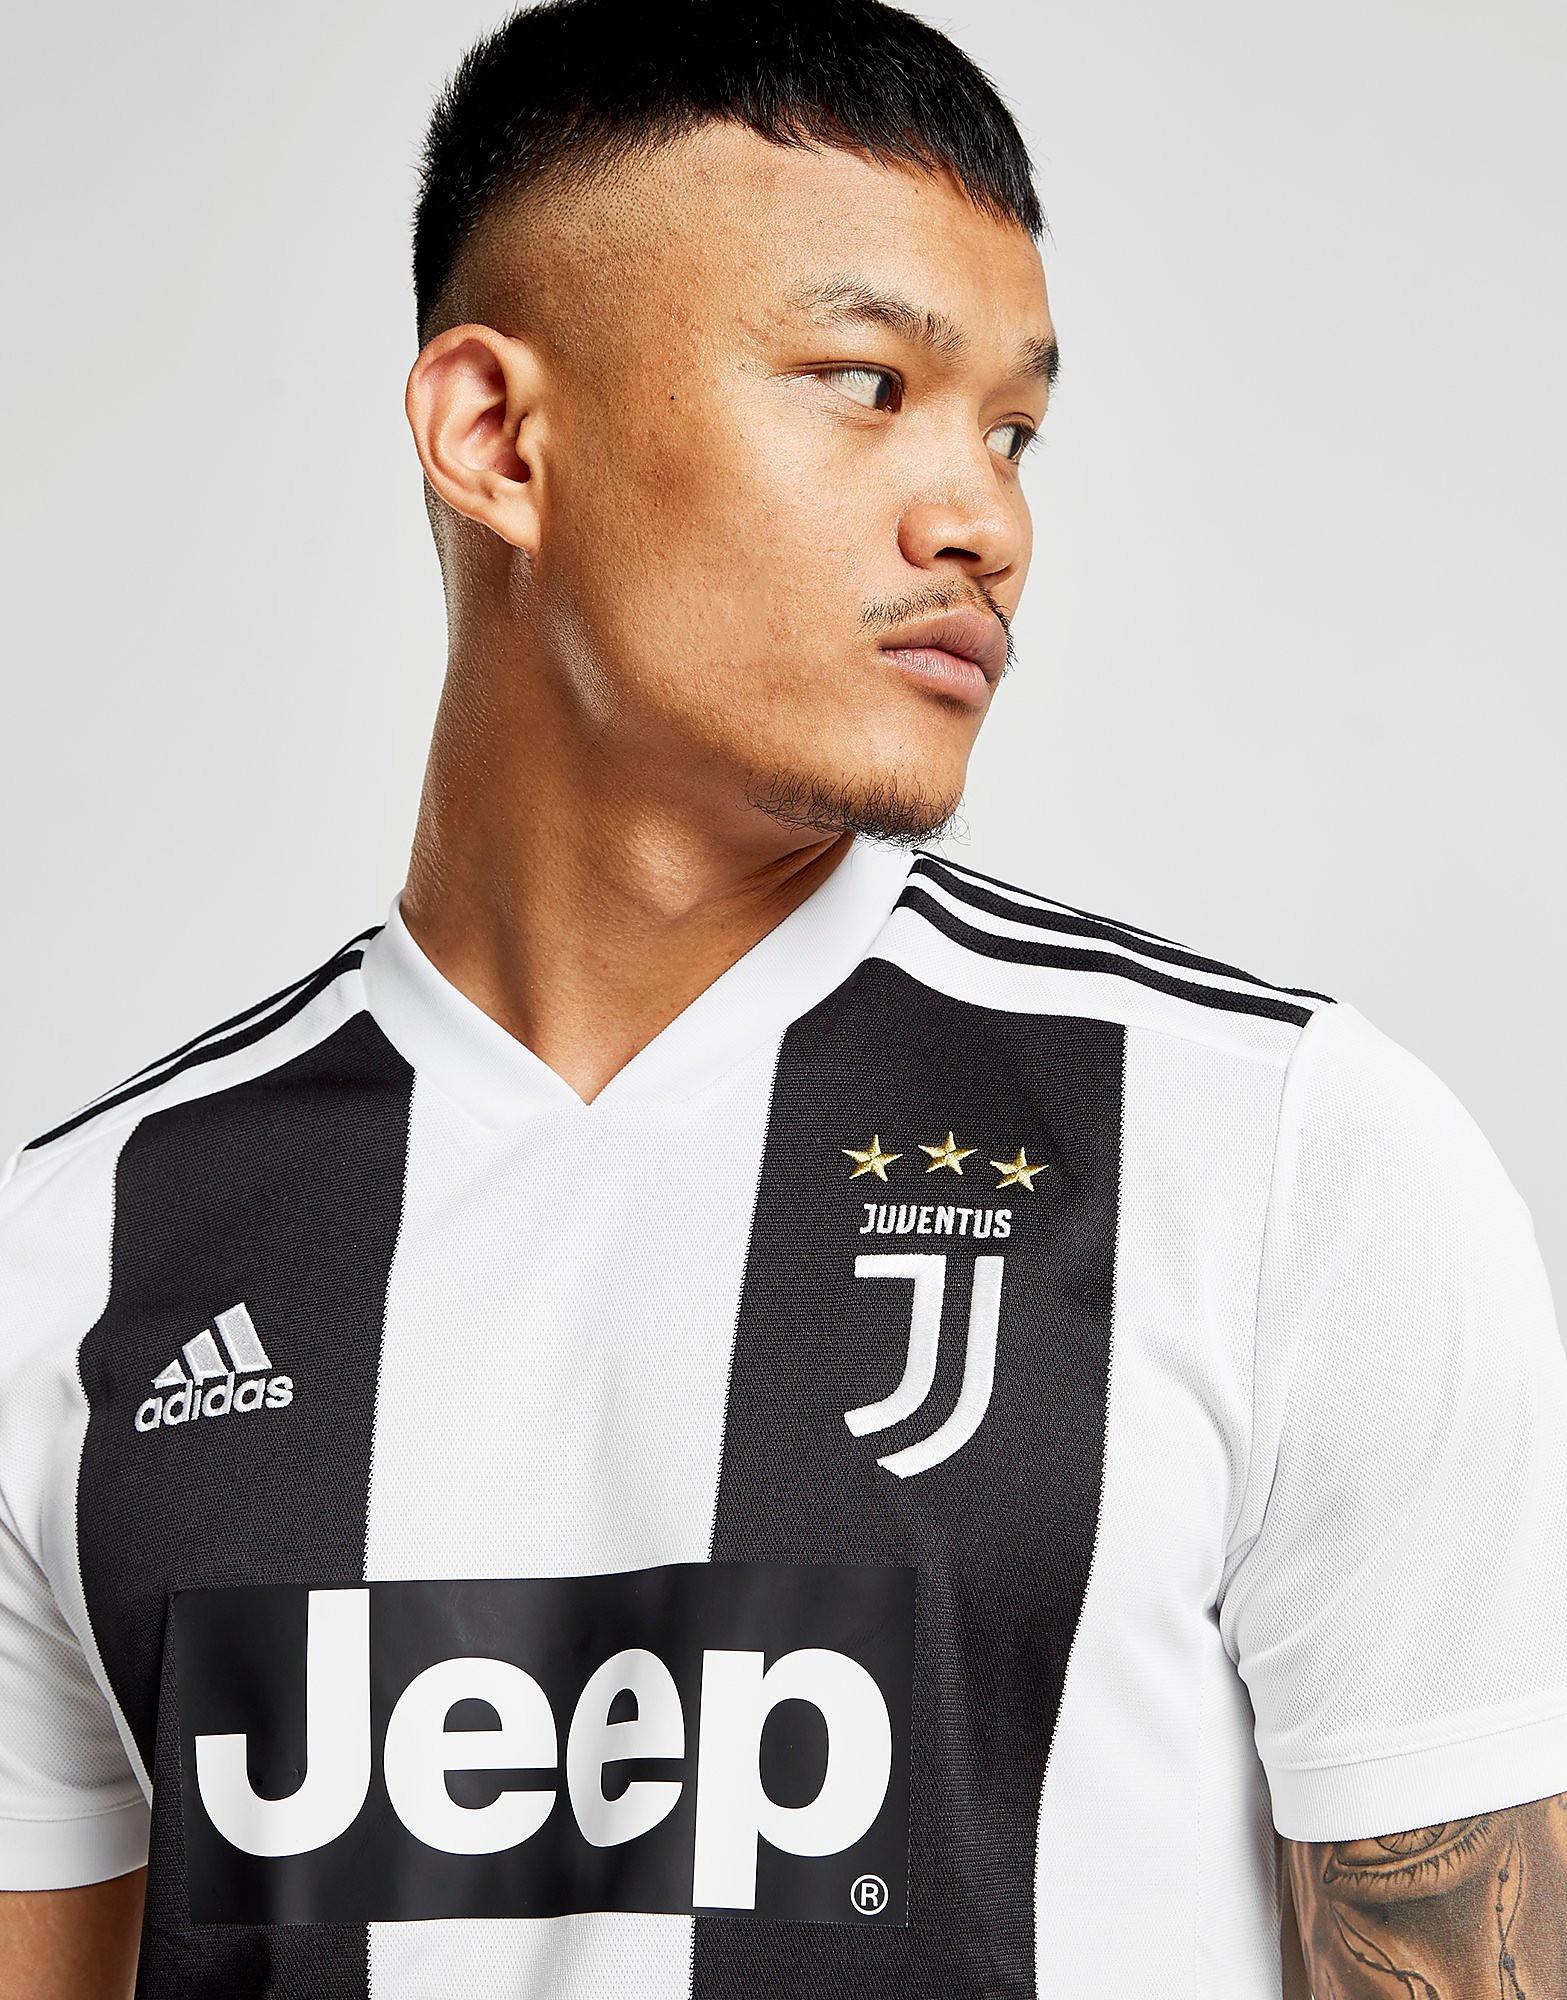 adidas Juventus 2018/19 Maglia Home PREORDINE